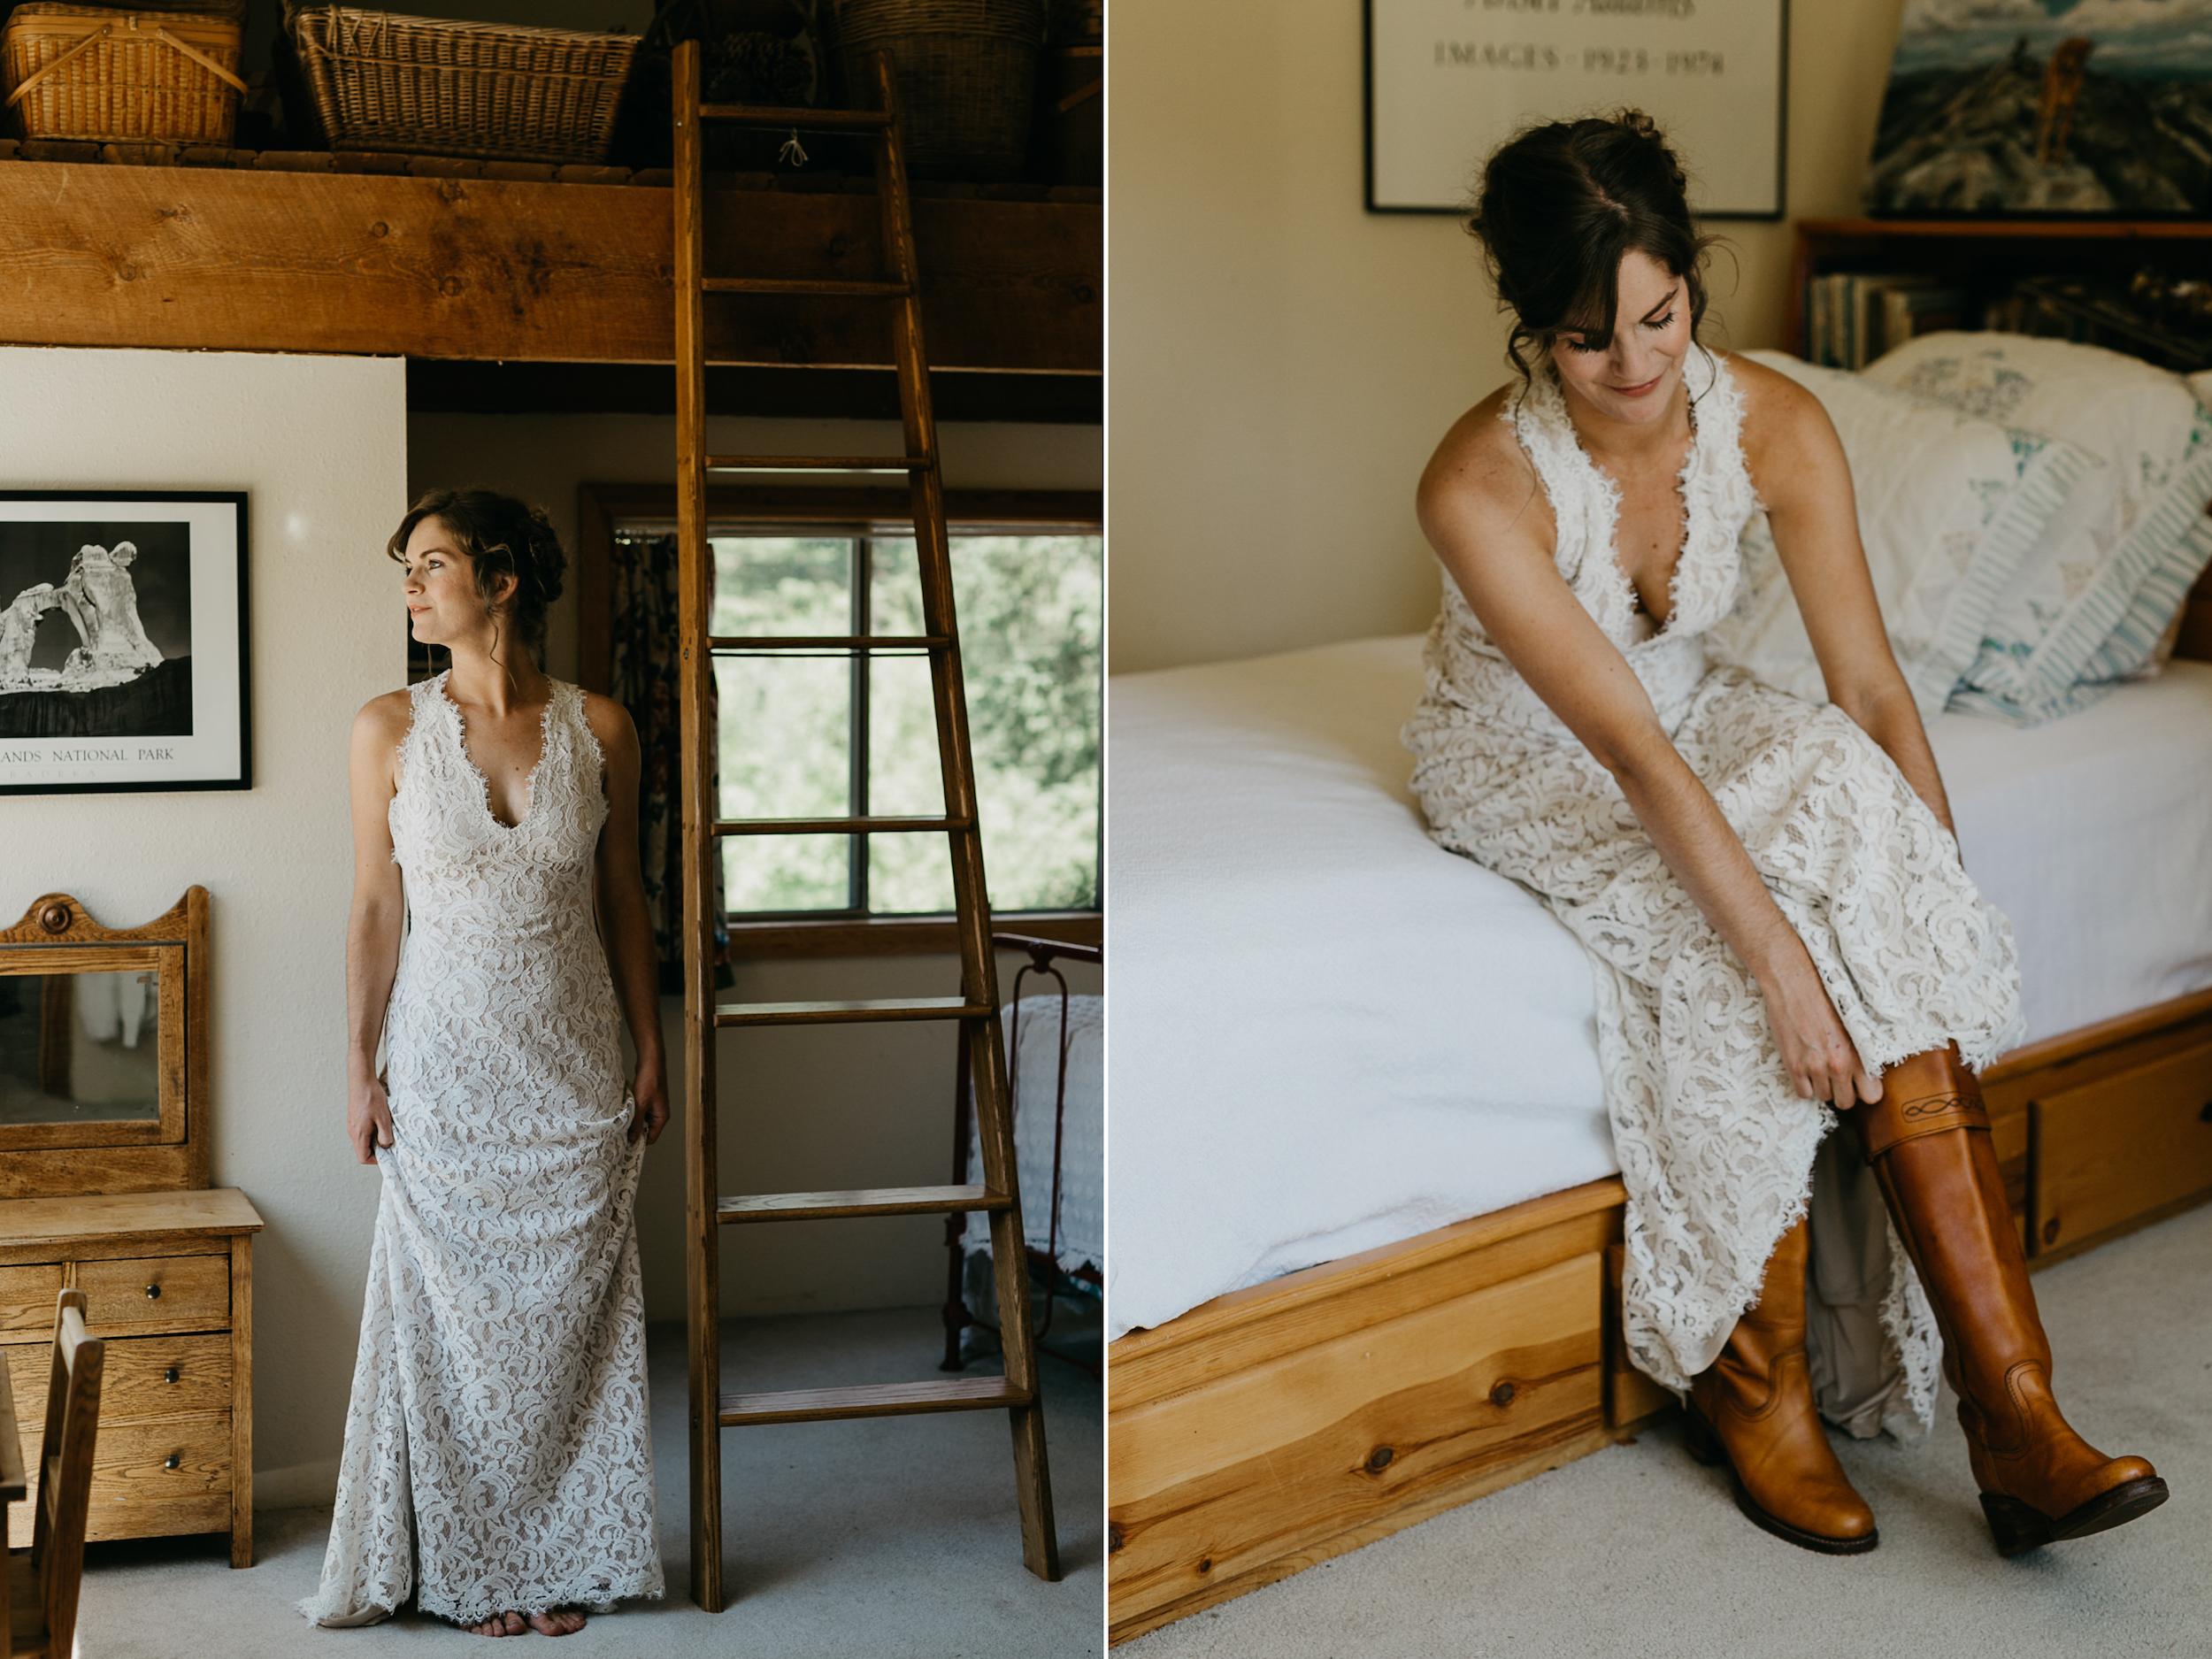 wallowa-mountains-wedding-photographer007.jpg